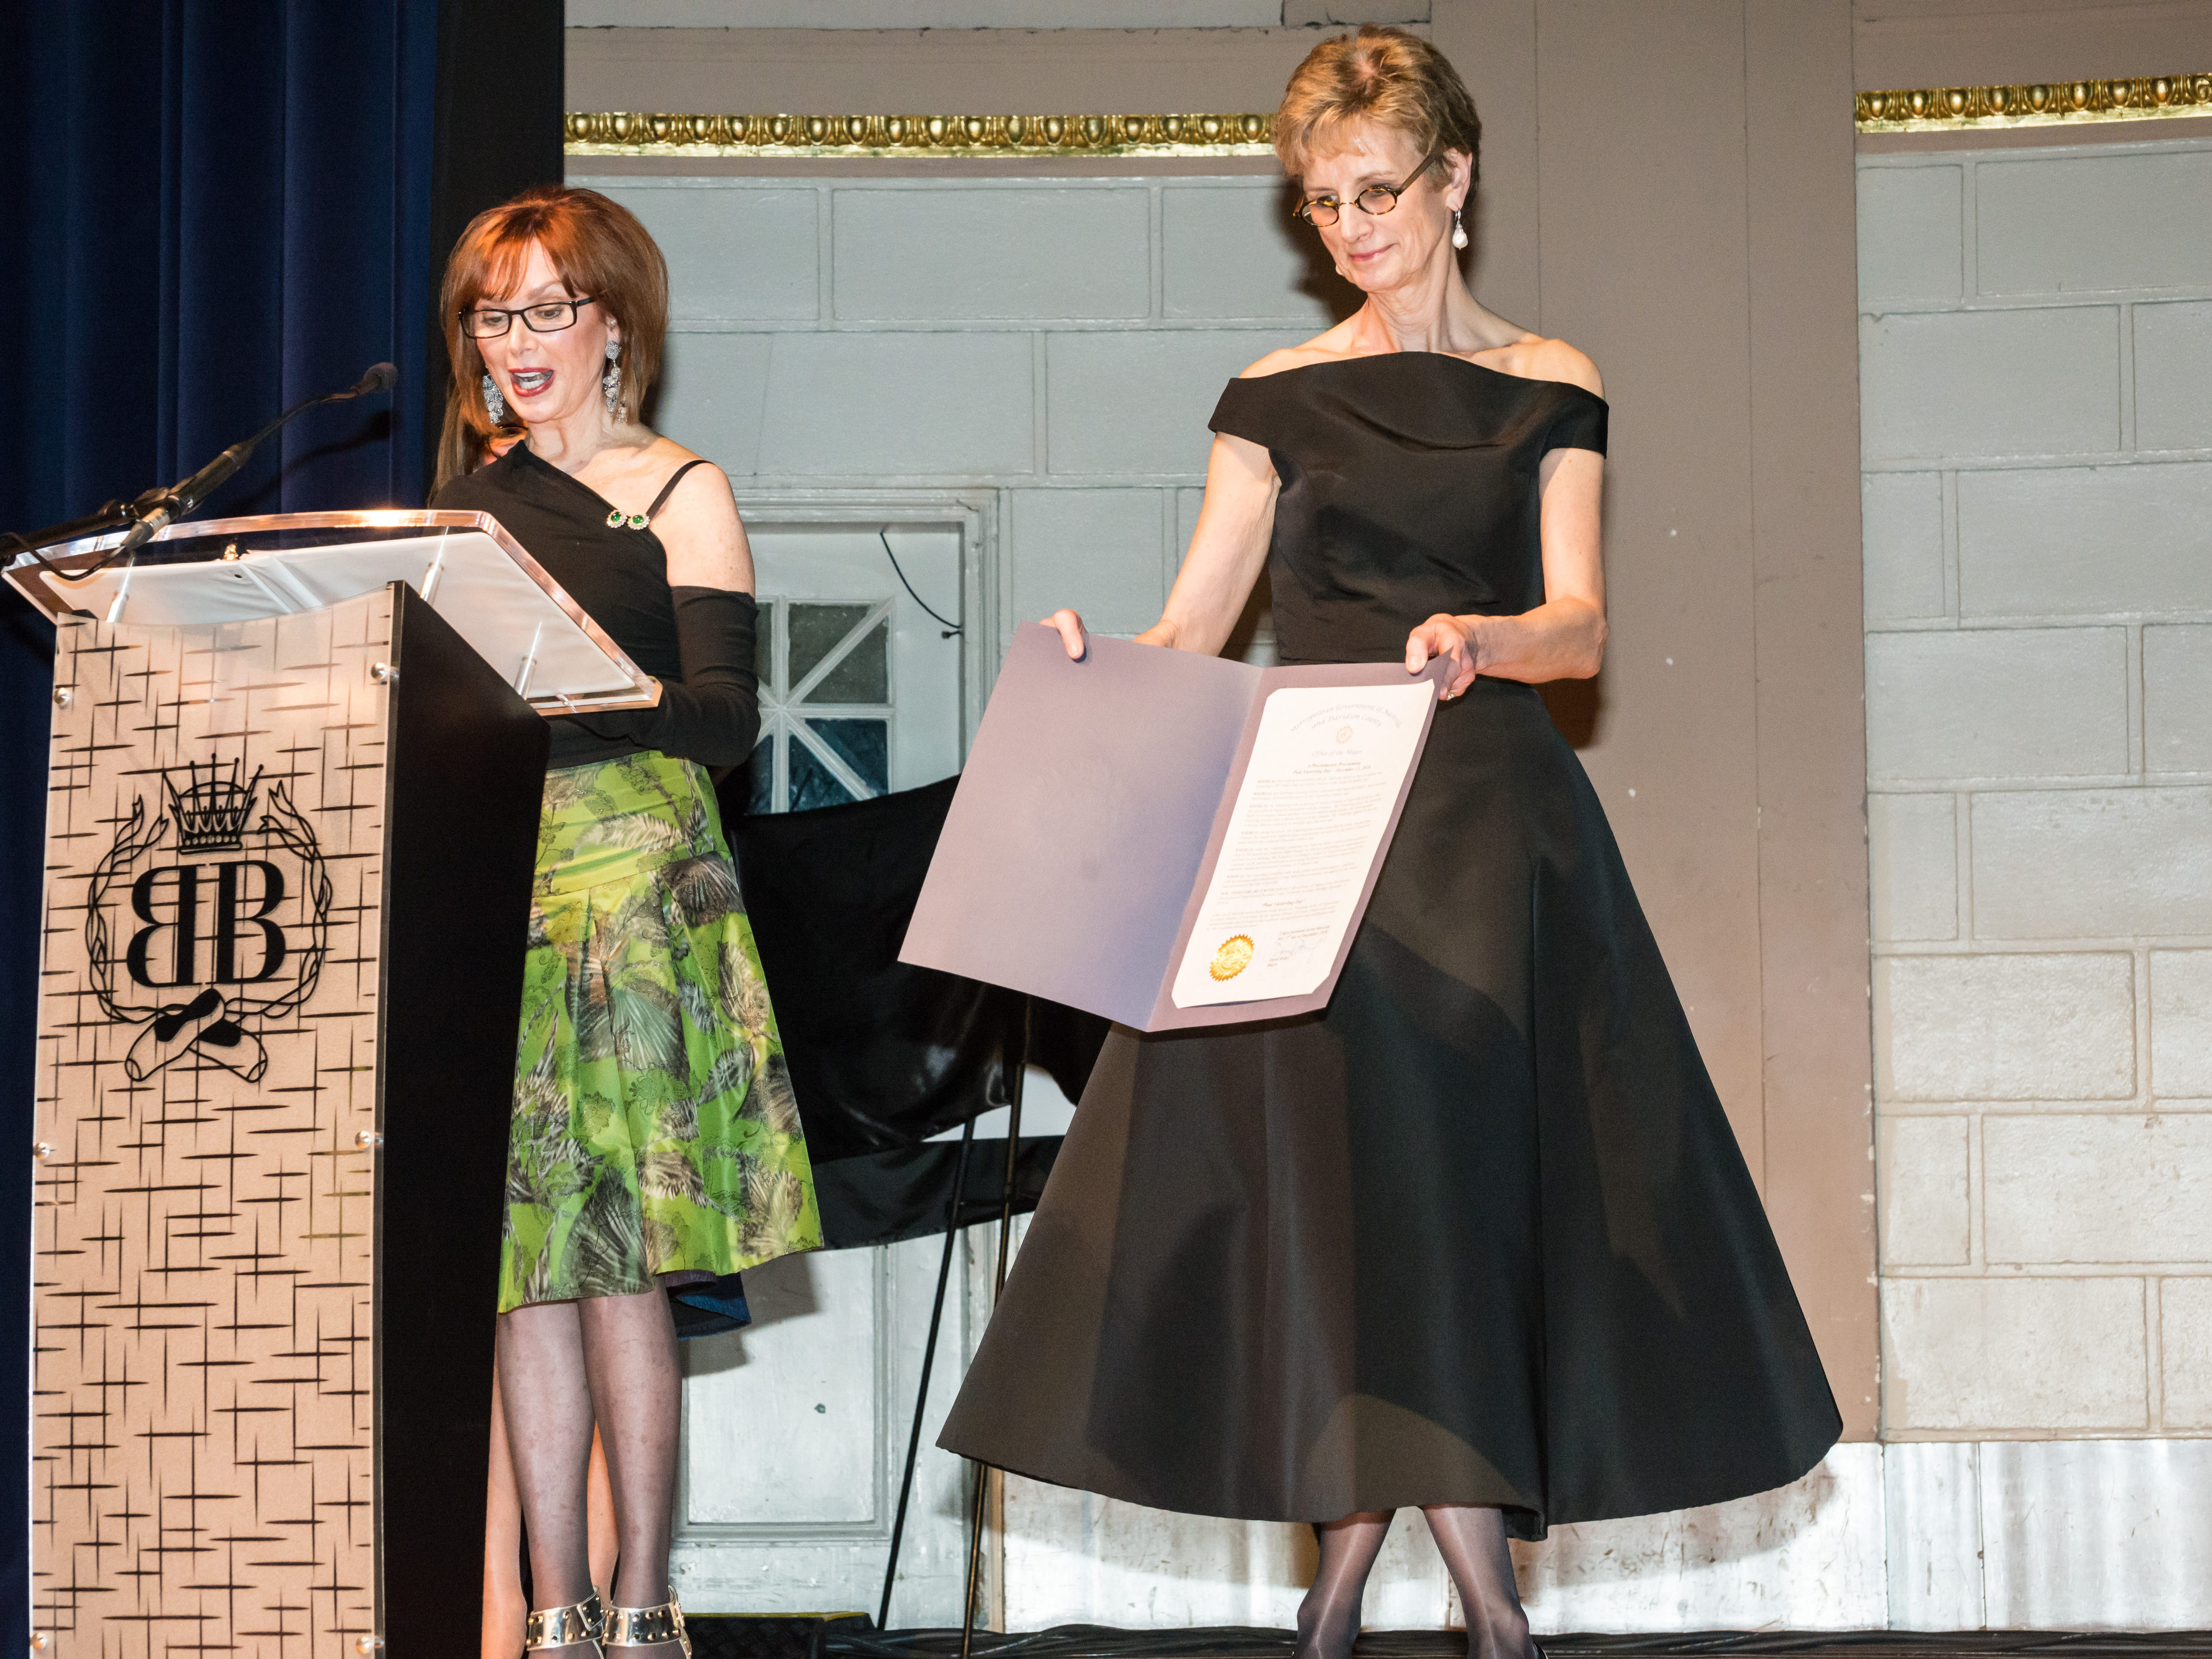 Susan Lipman and Heather Thorne